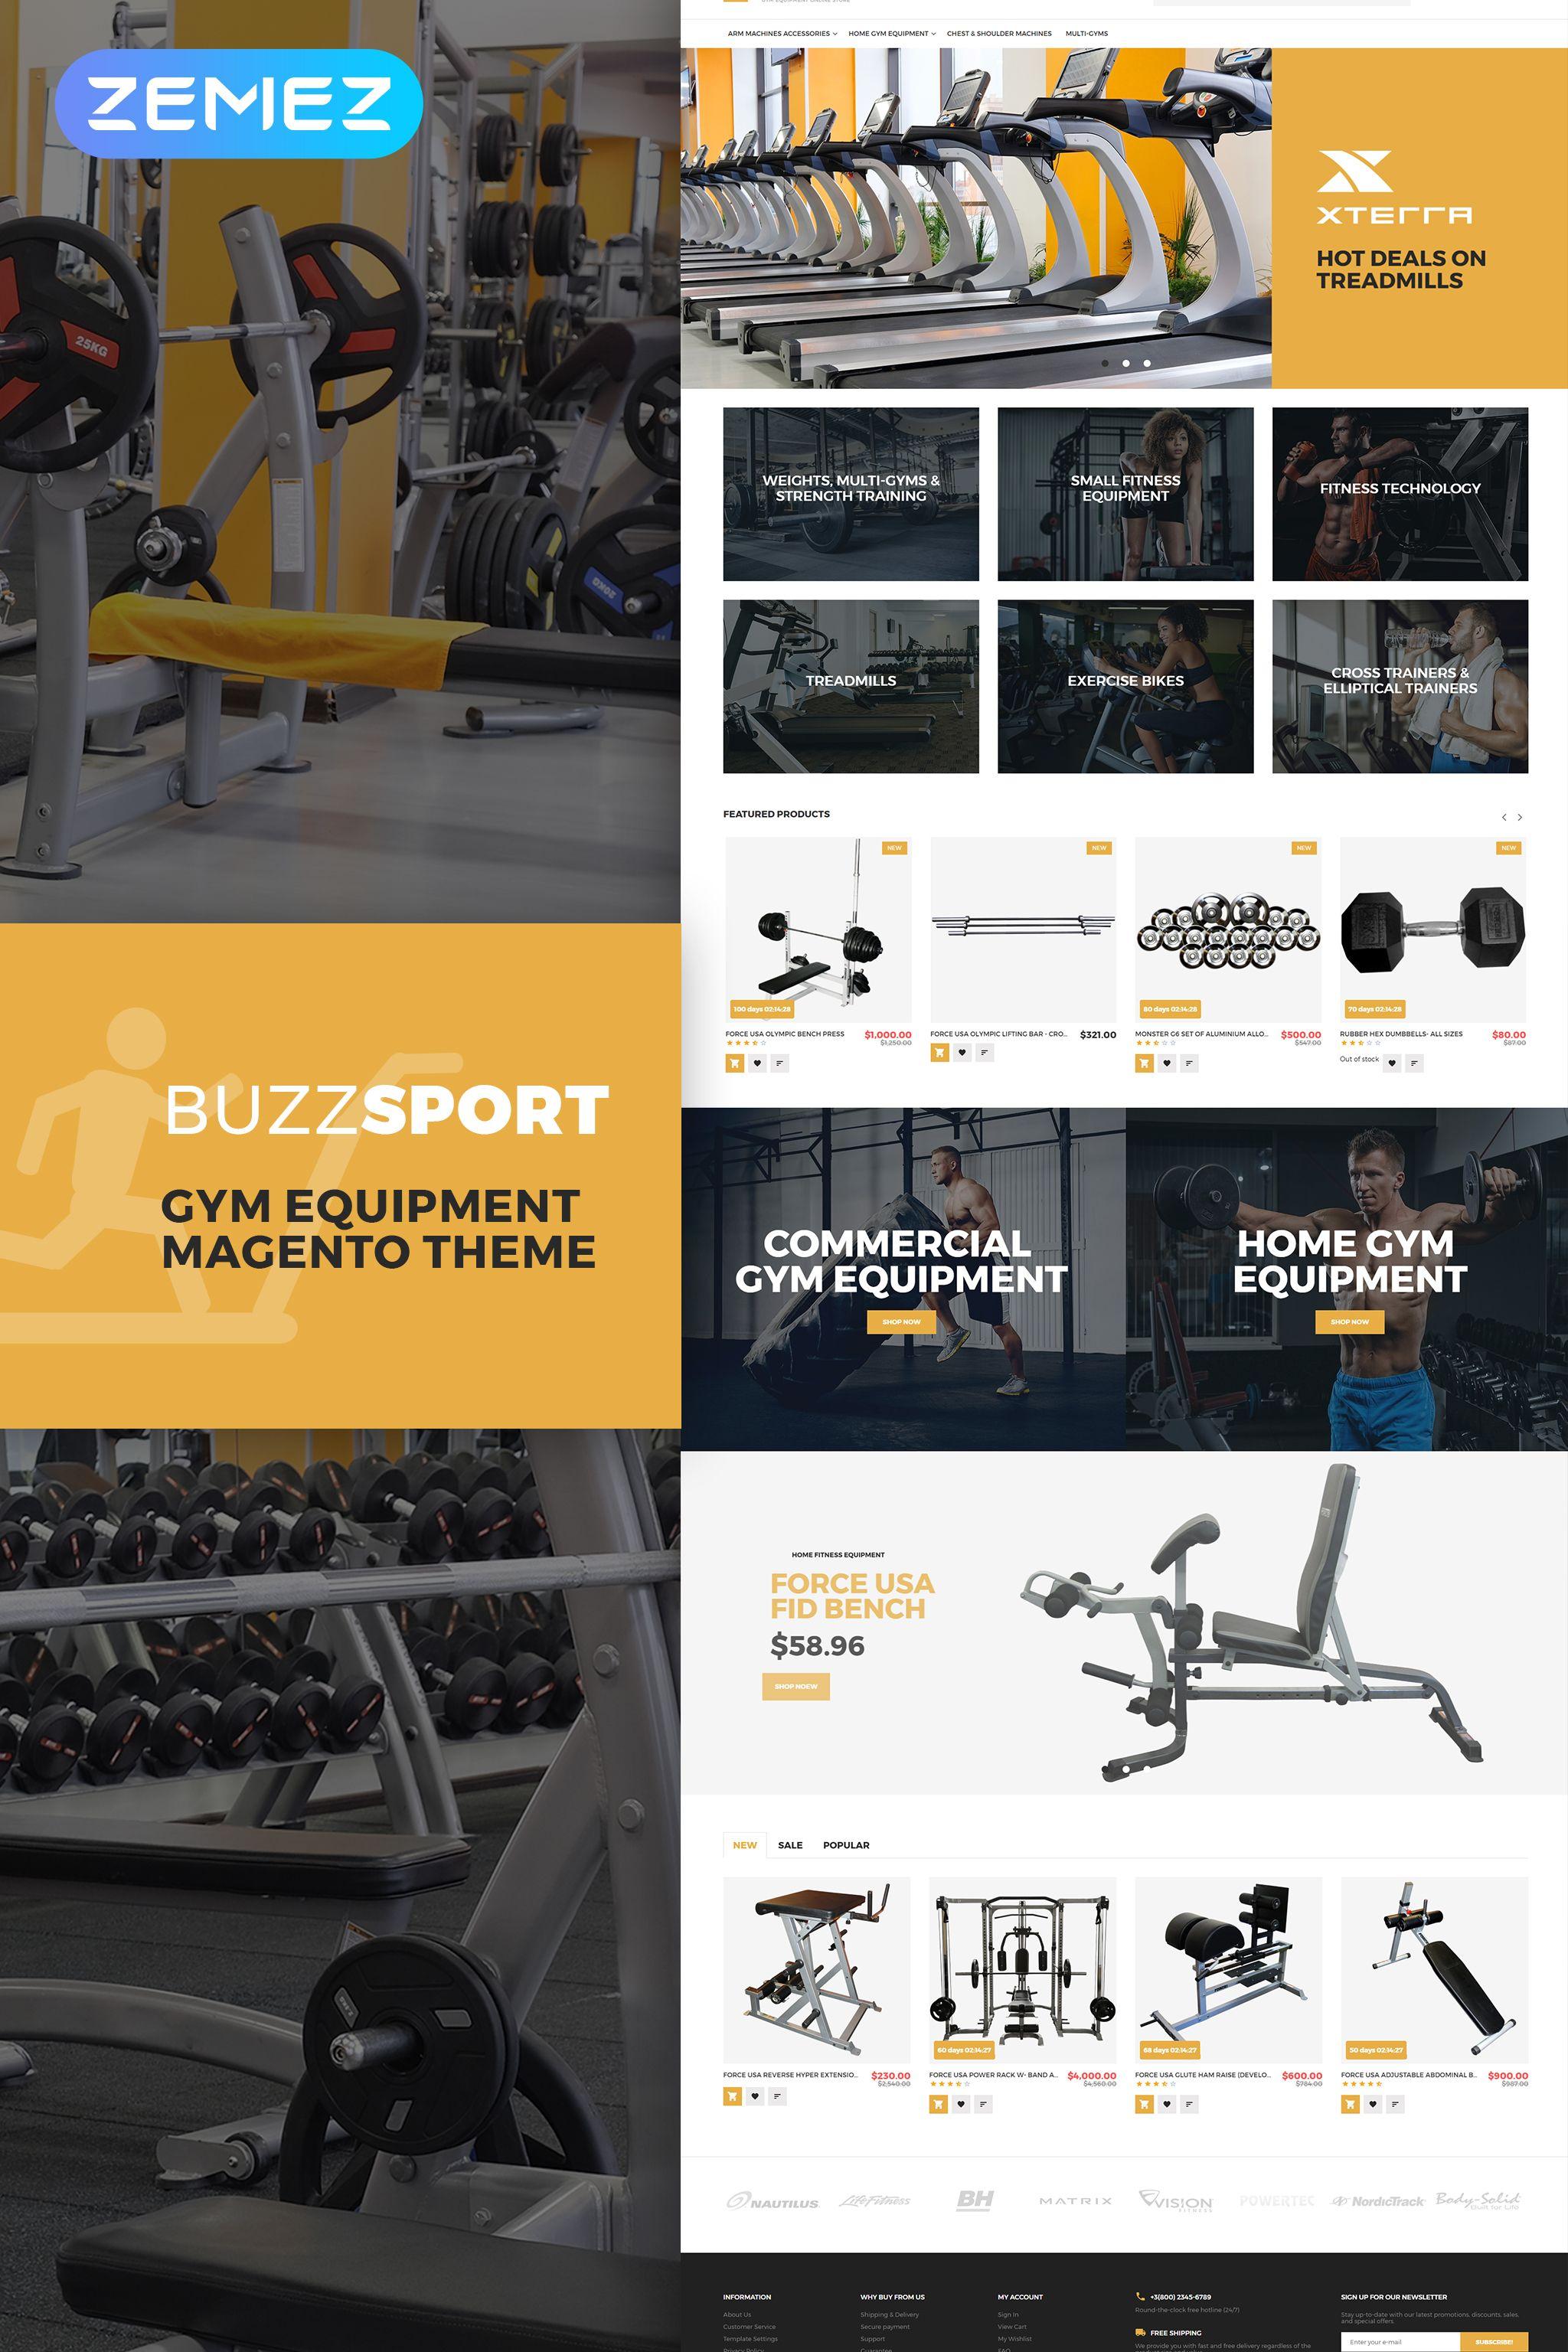 Buzzsport Gym Equipment Magento Theme Templatemonster Magento Themes Gym Equipment Gym